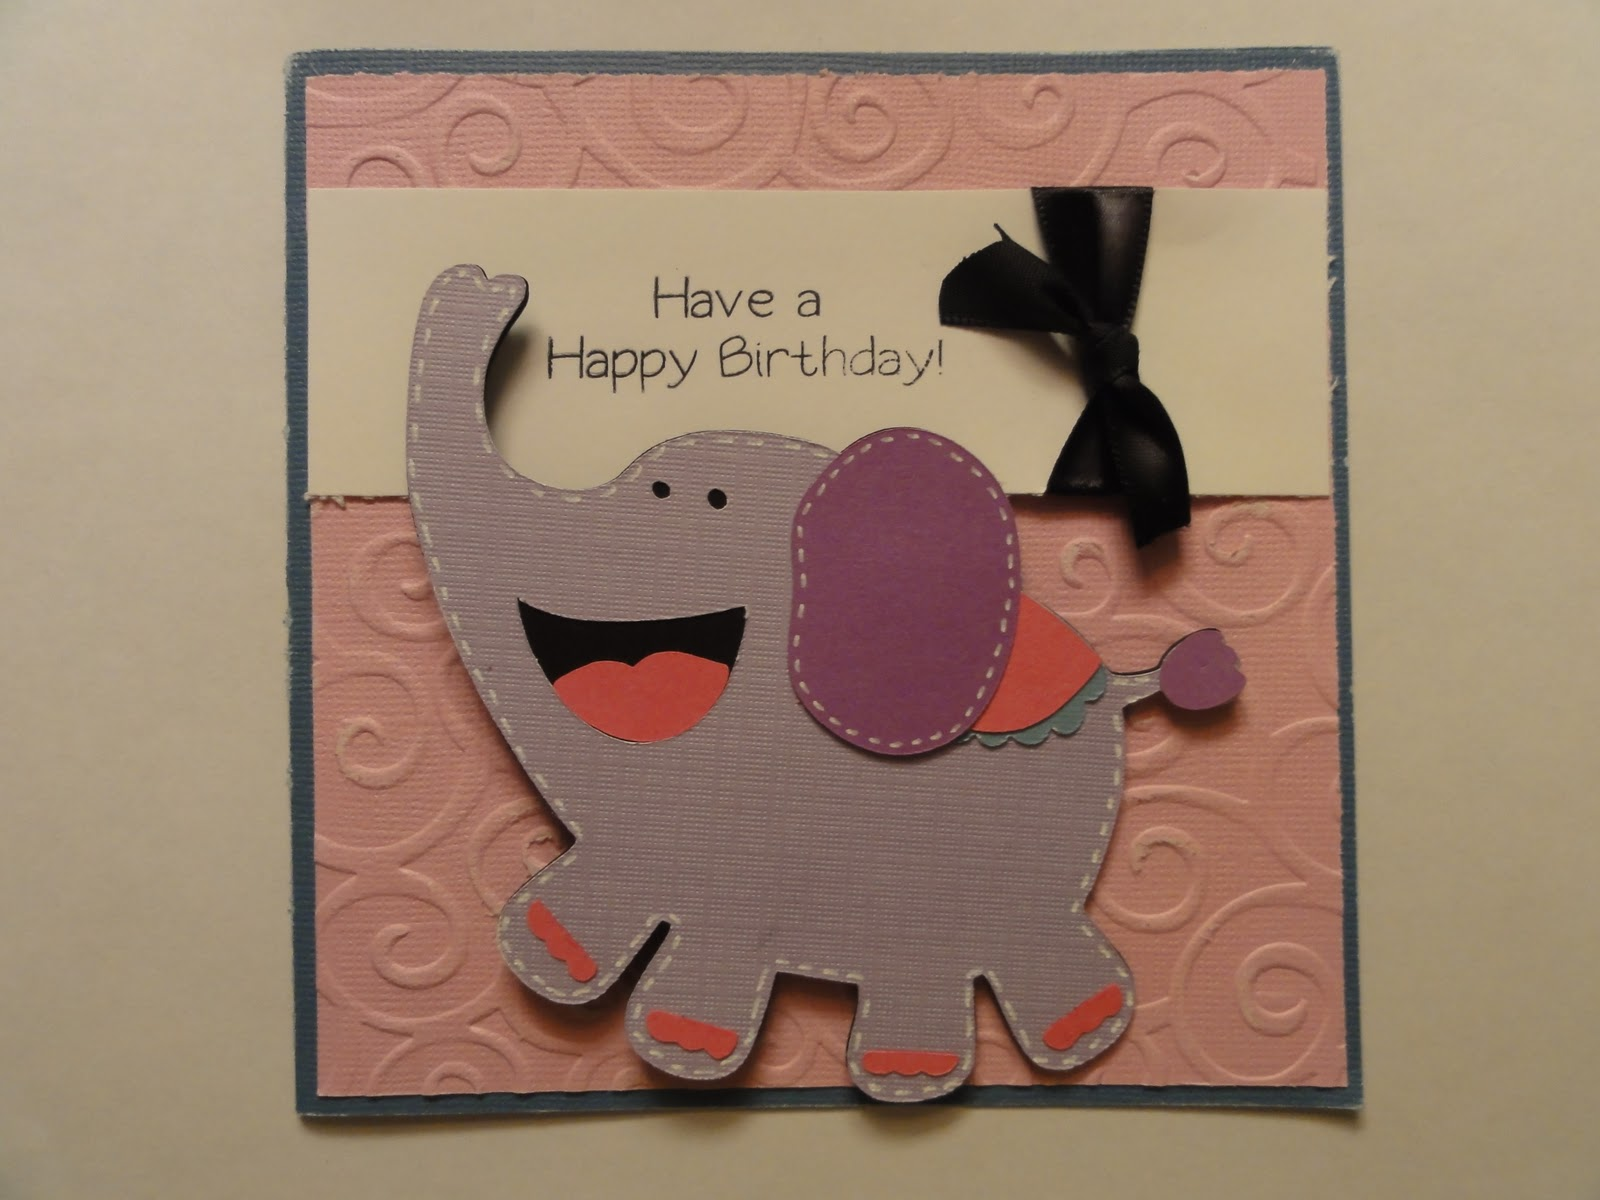 Krafty Kyle Designs Birthday Bash Simple Card Ideas Have A Happy